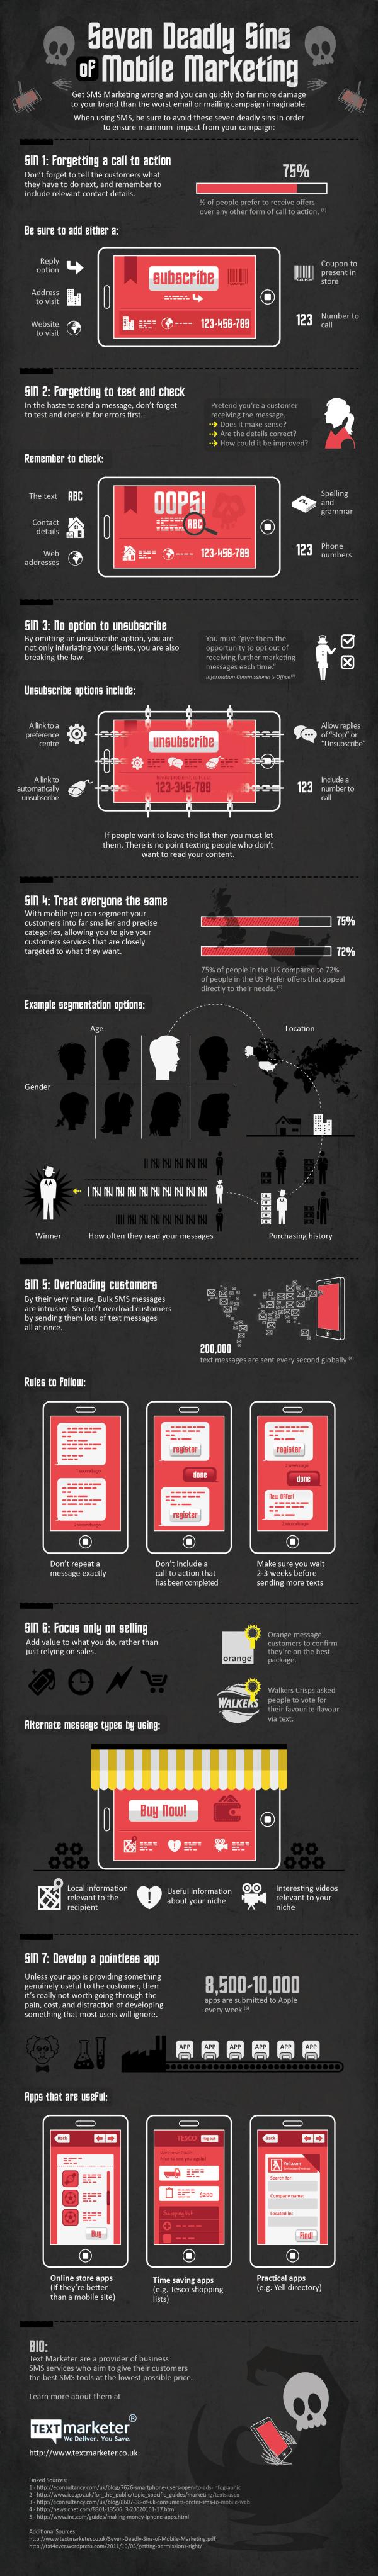 Mobile Marketing Sins resized 600